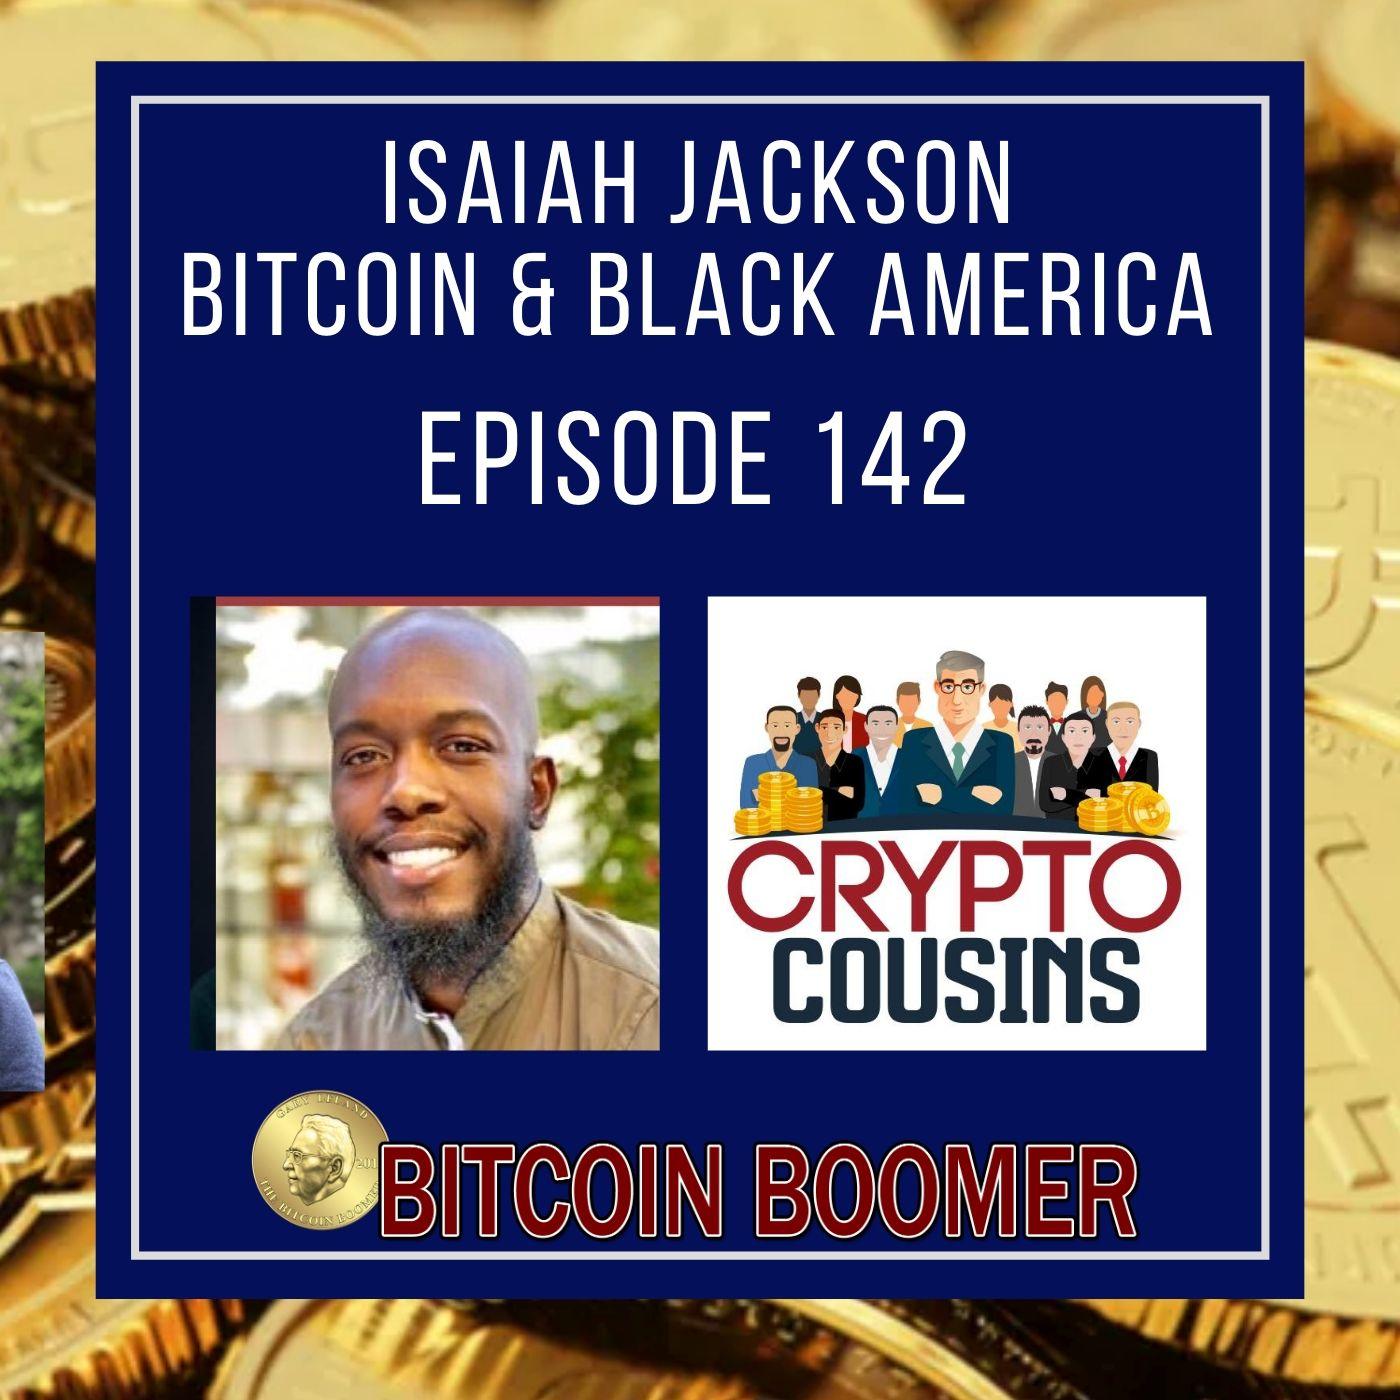 Isaiah Jackson -  Bitcoin and Black America